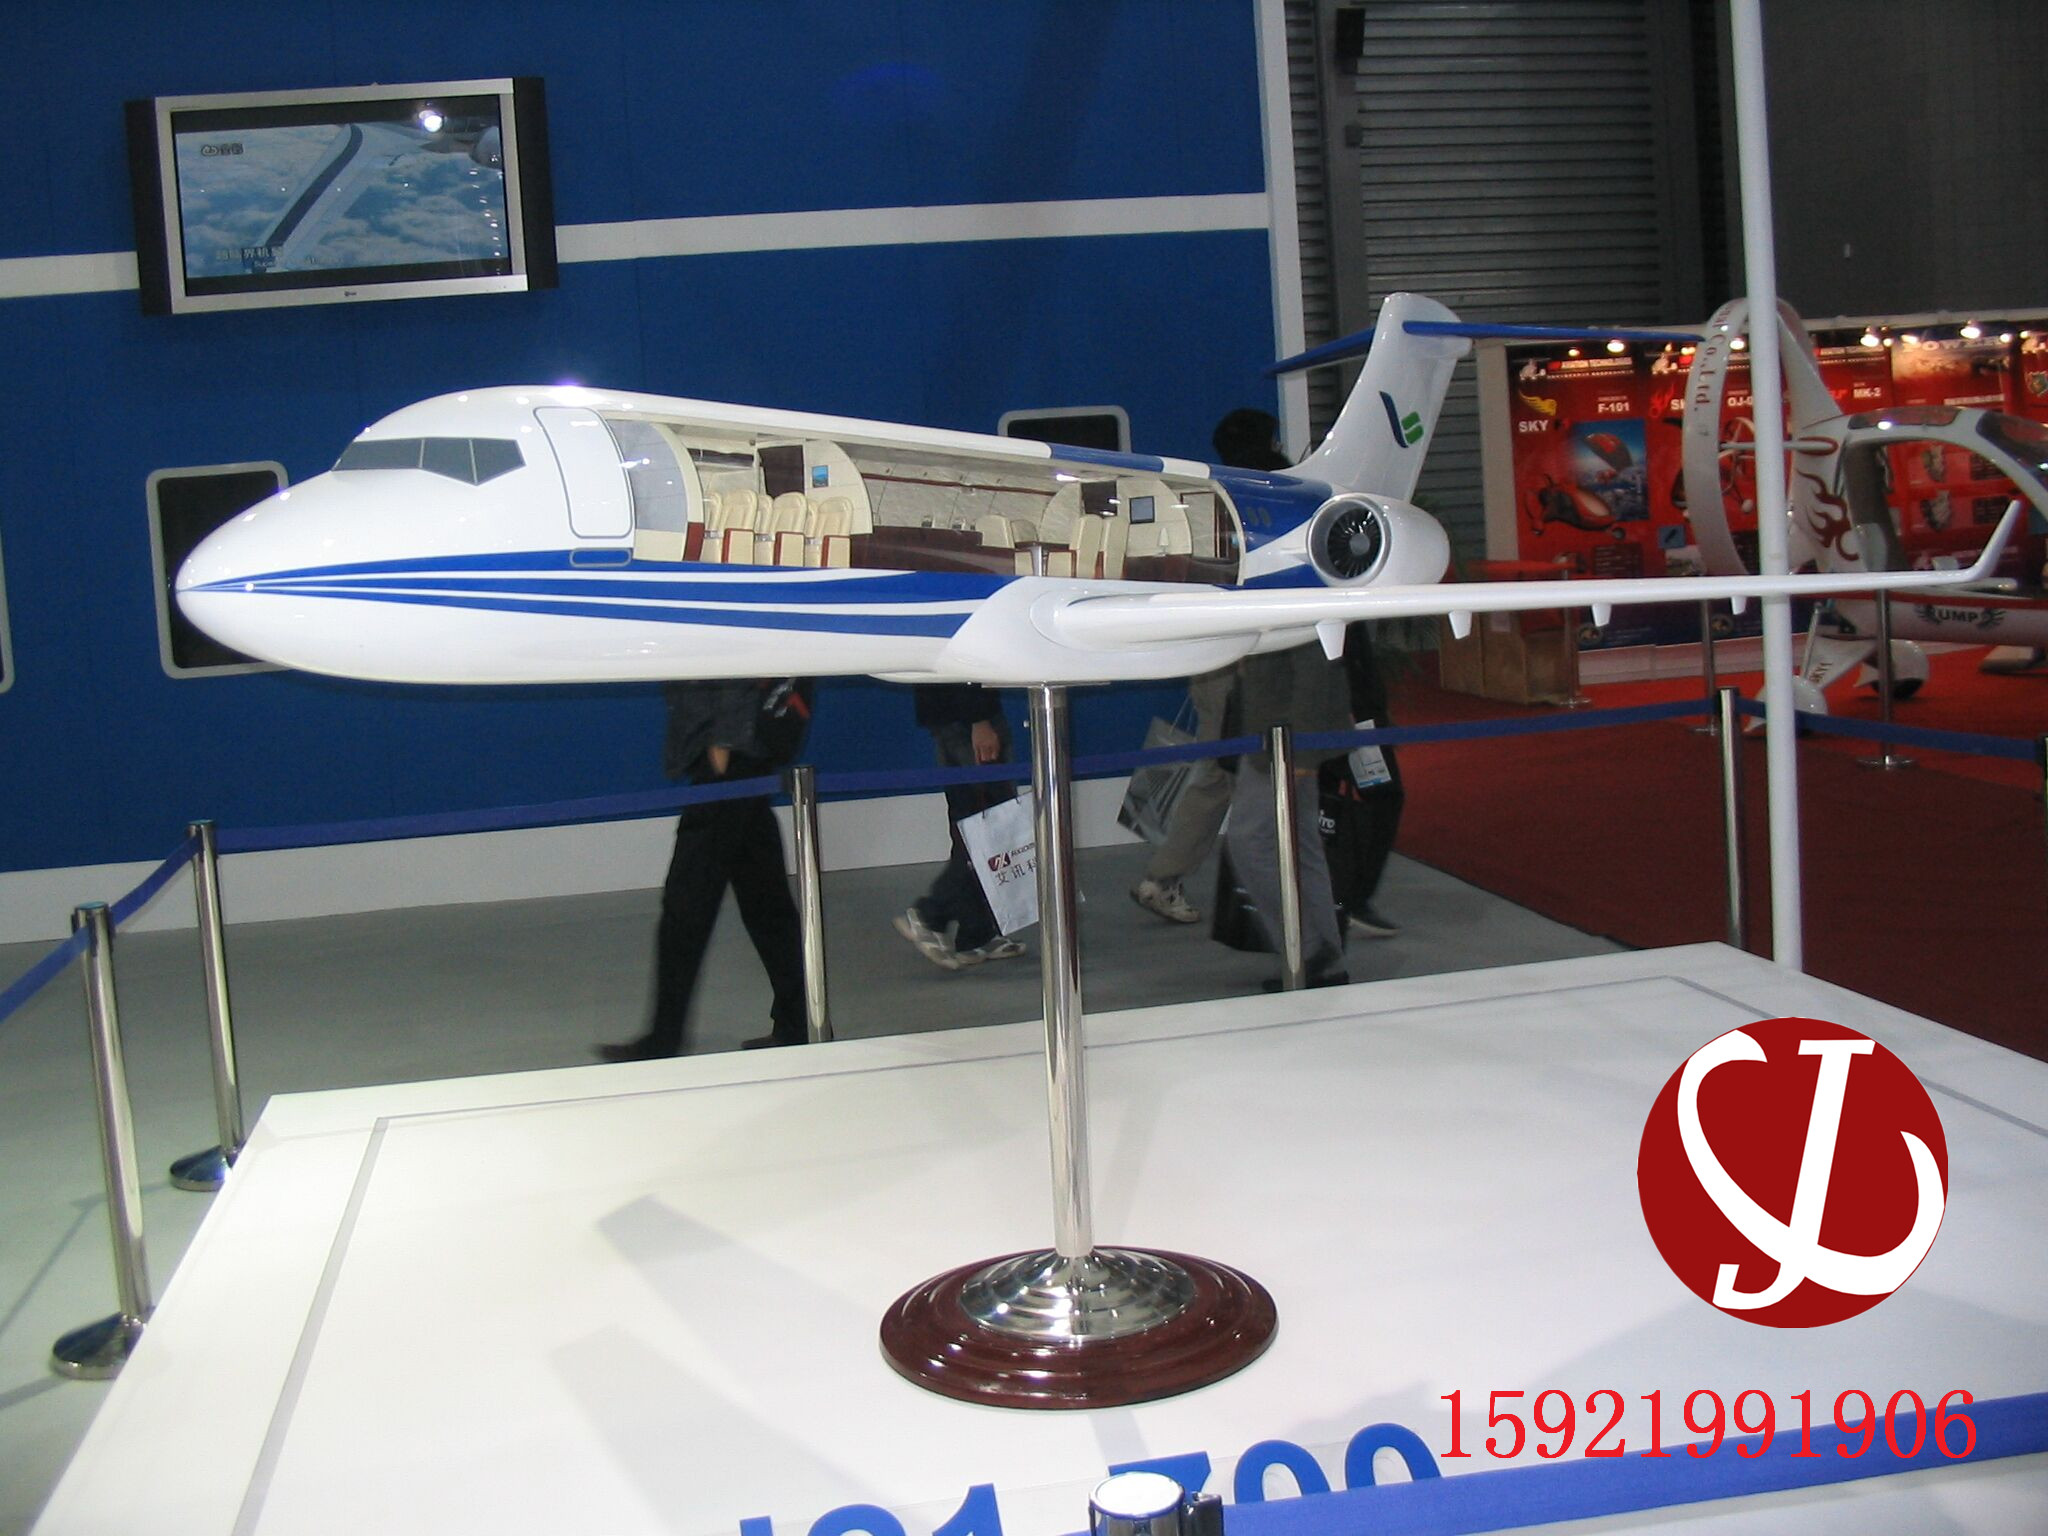 飞机模型 (2)